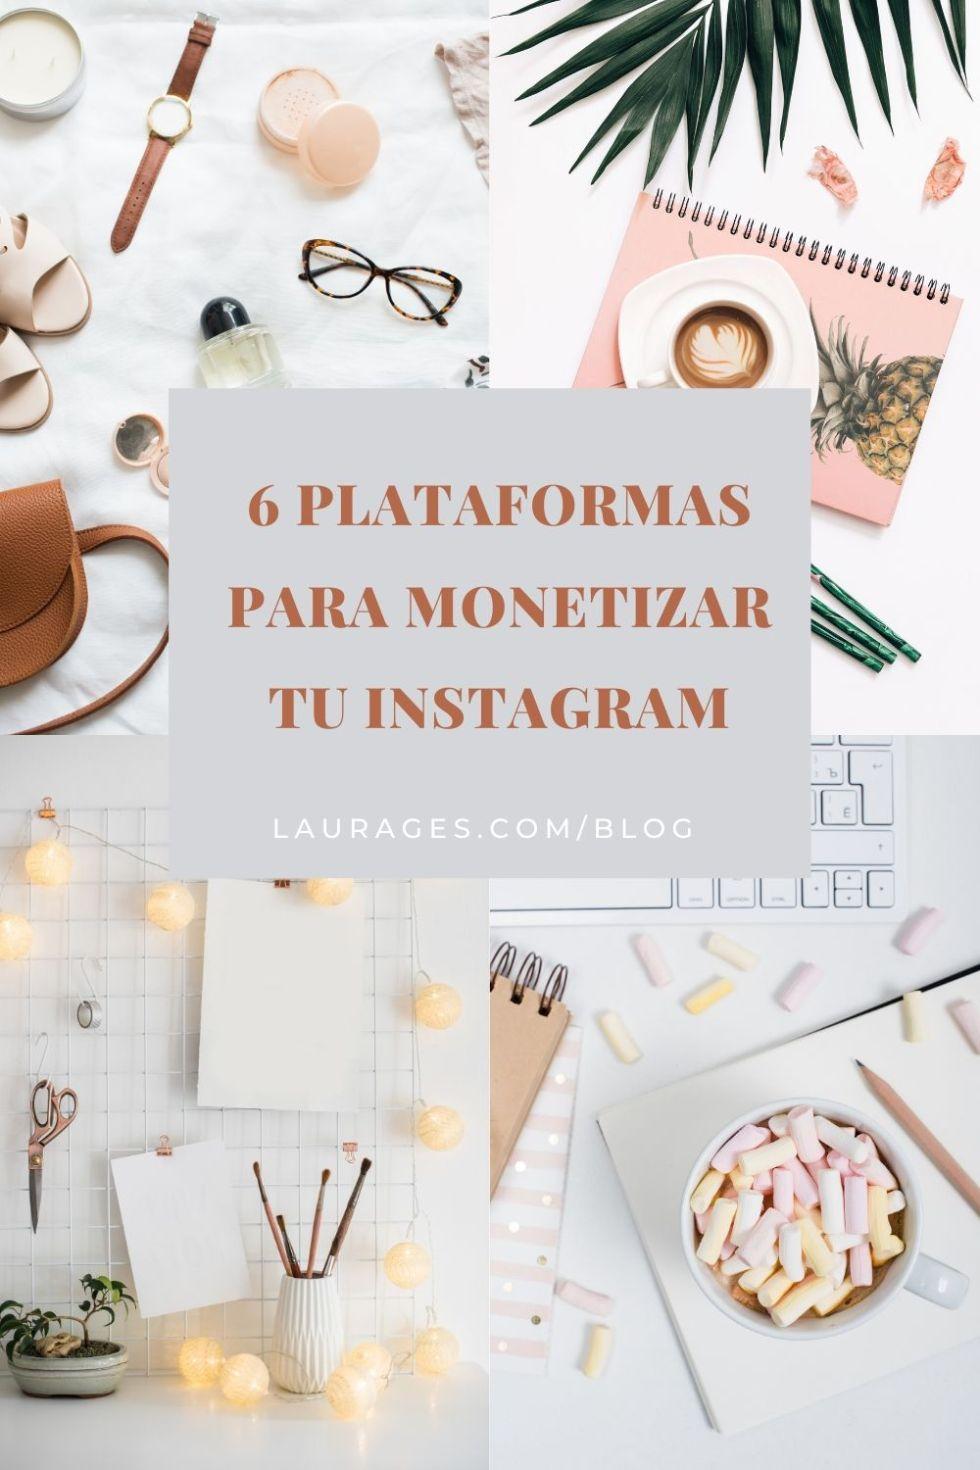 Plataformas para monetizar Instagram